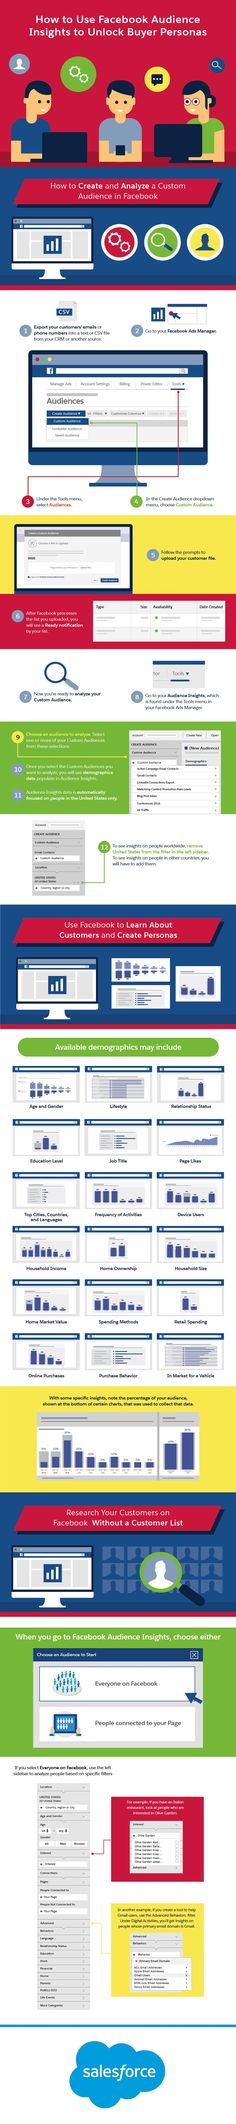 Social Media Marketing Cheat Sheet 2017 (Infographic) #socialmedia